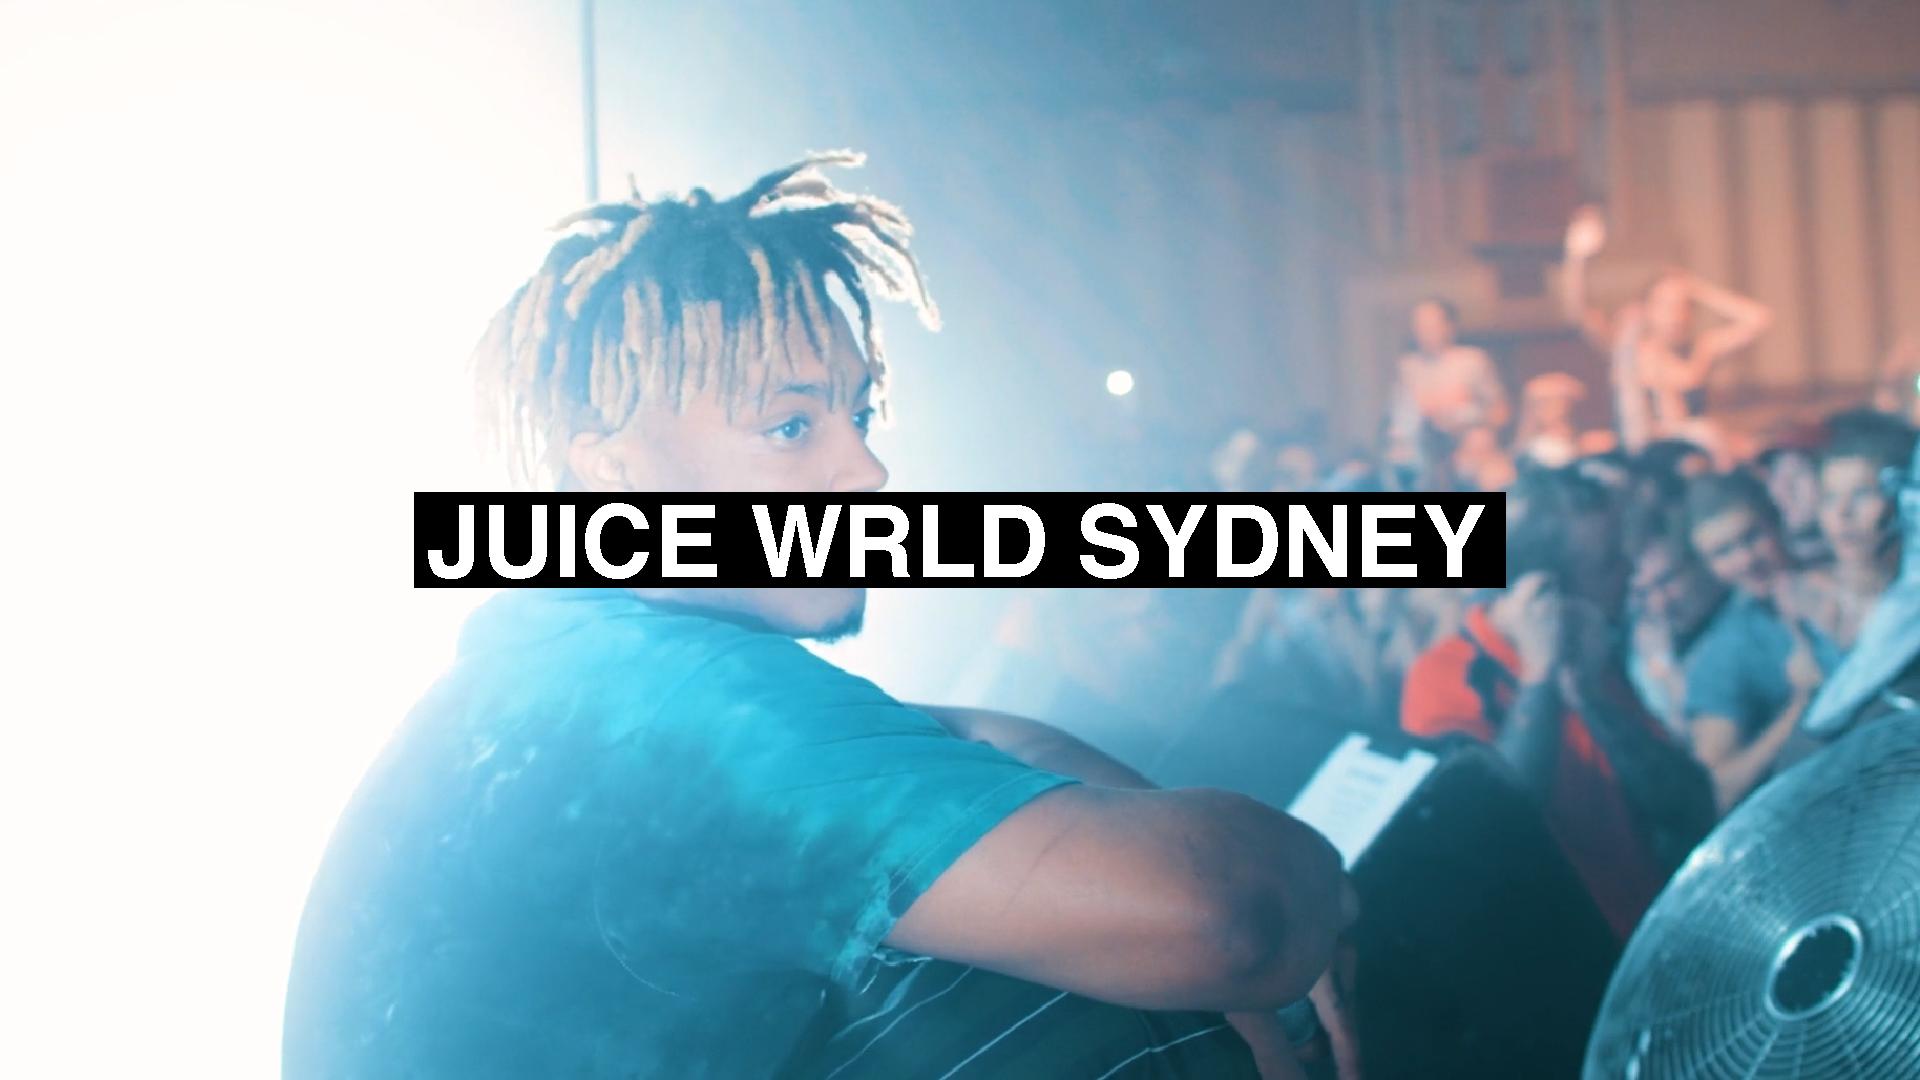 juice wrld.jpg